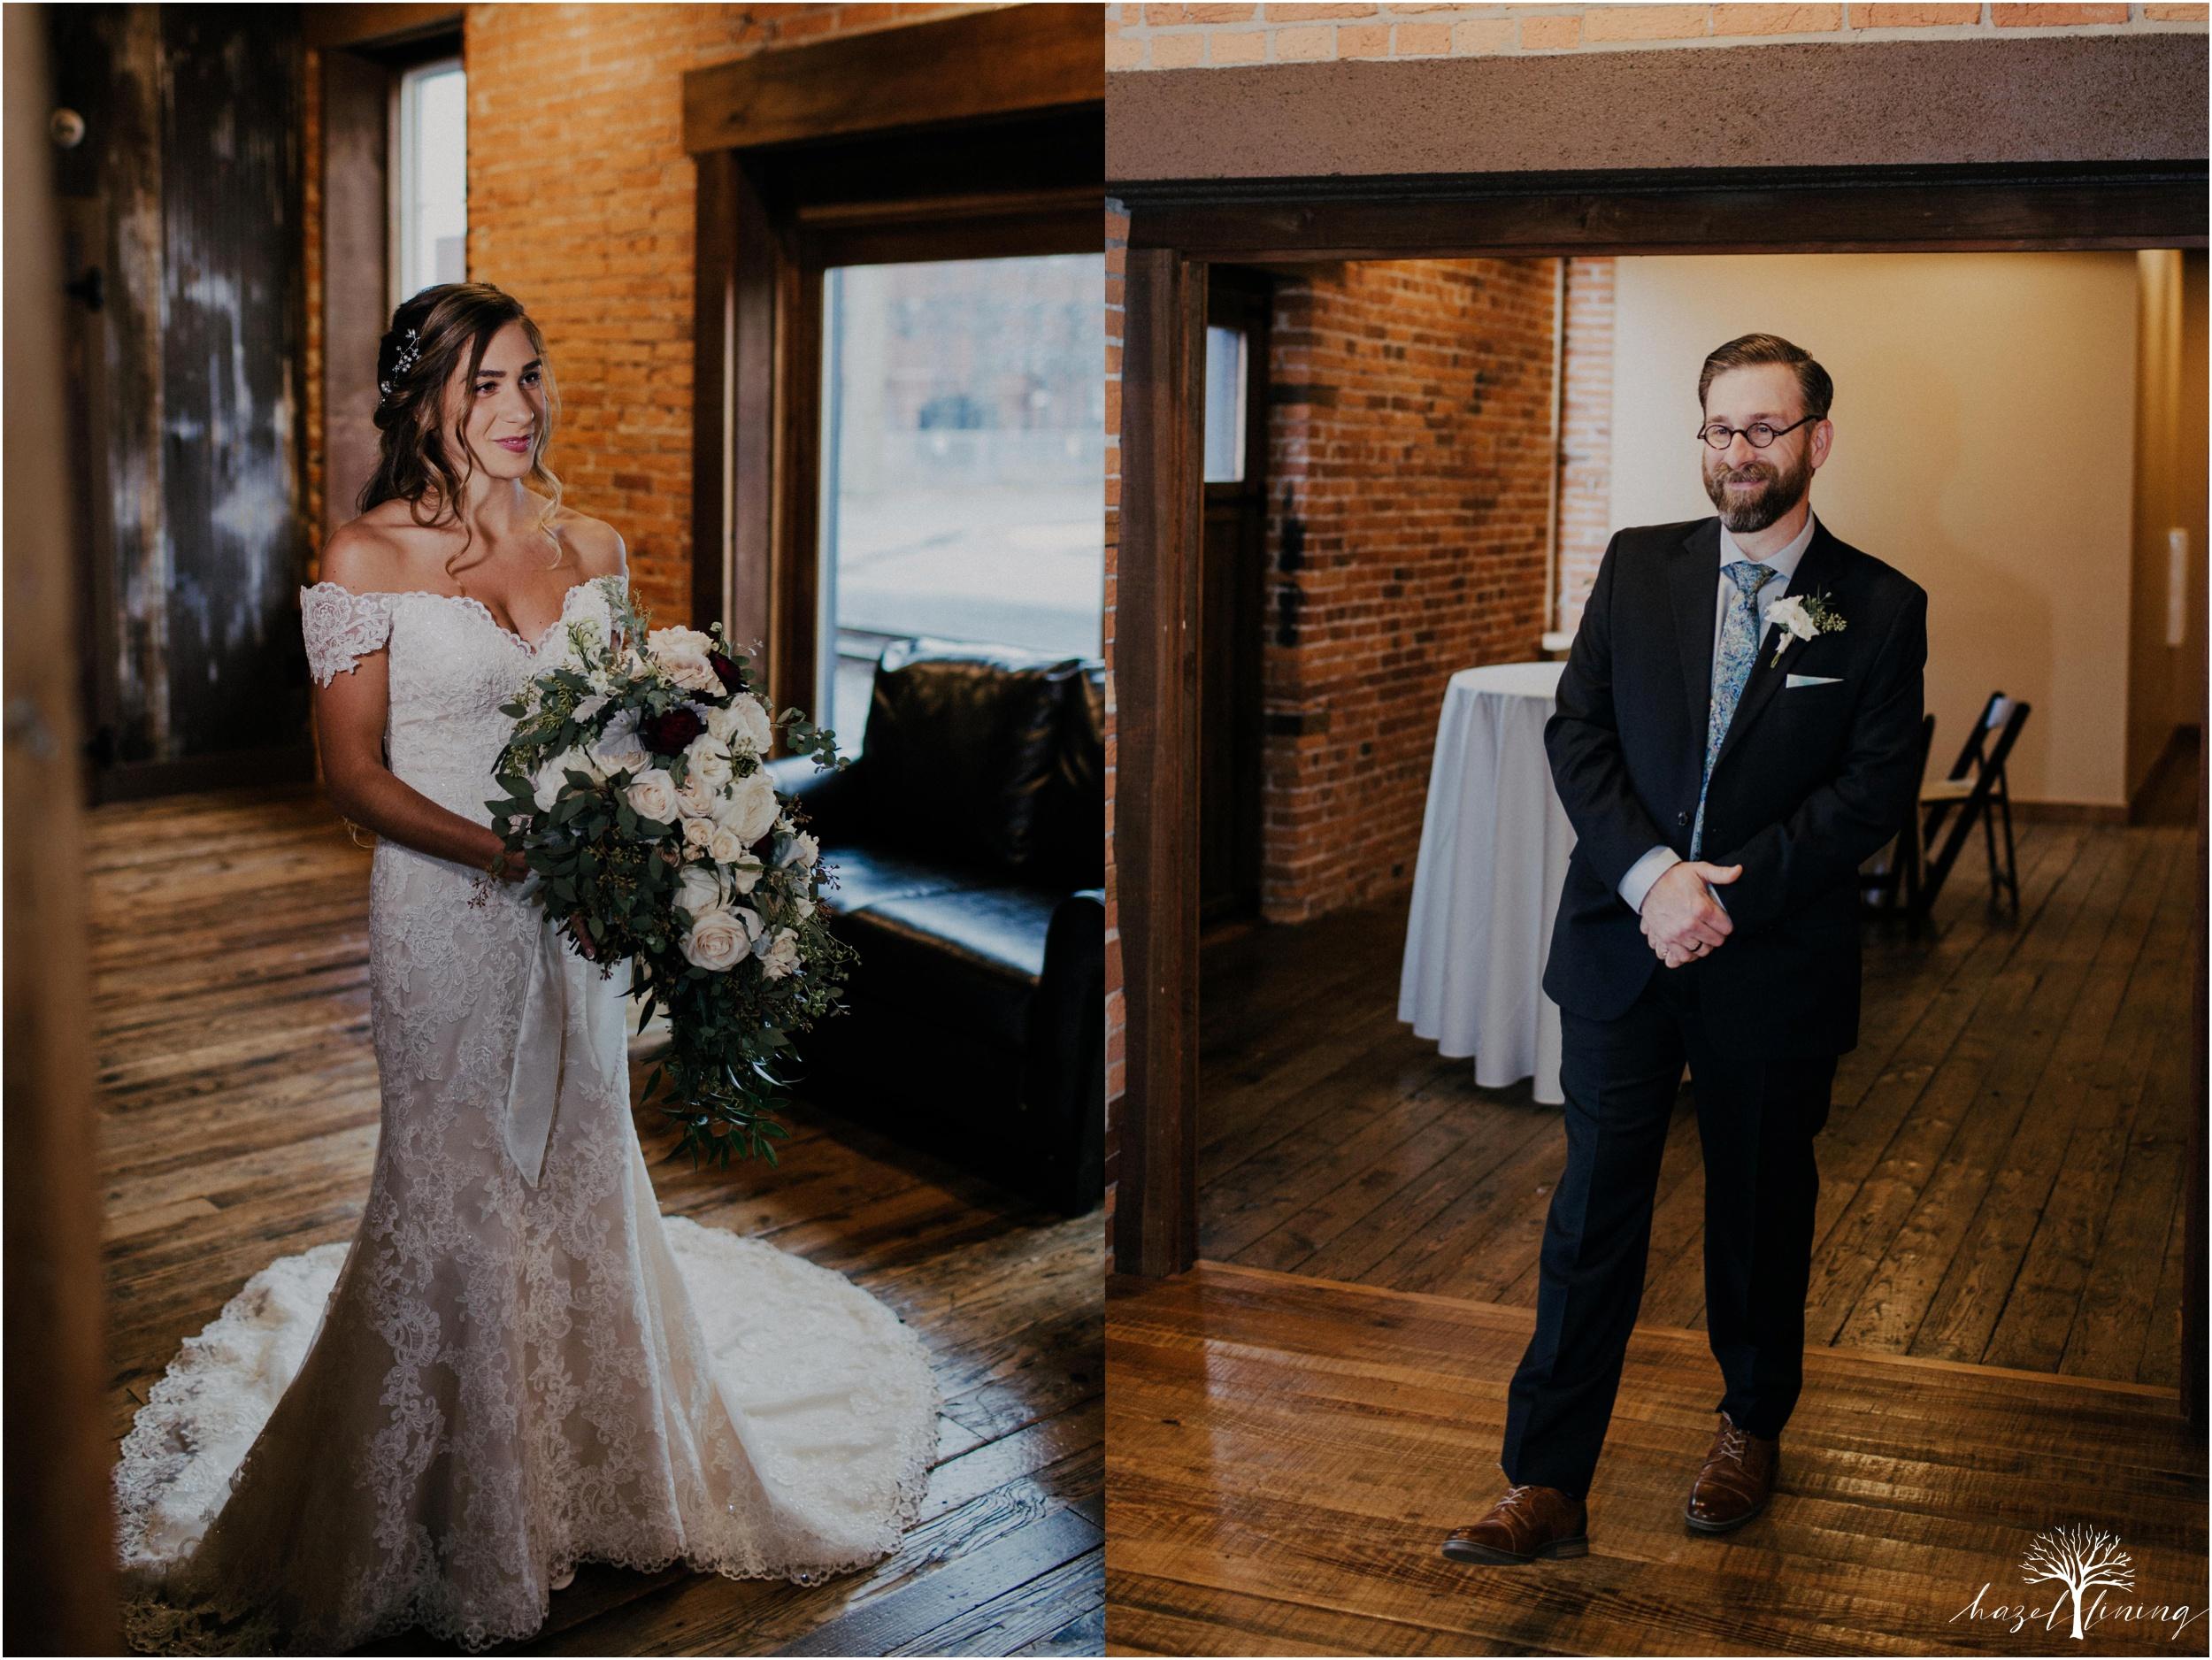 emma-matt-gehringer-the-booking-house-lancaster-manhiem-pennsylvania-winter-wedding_0025.jpg